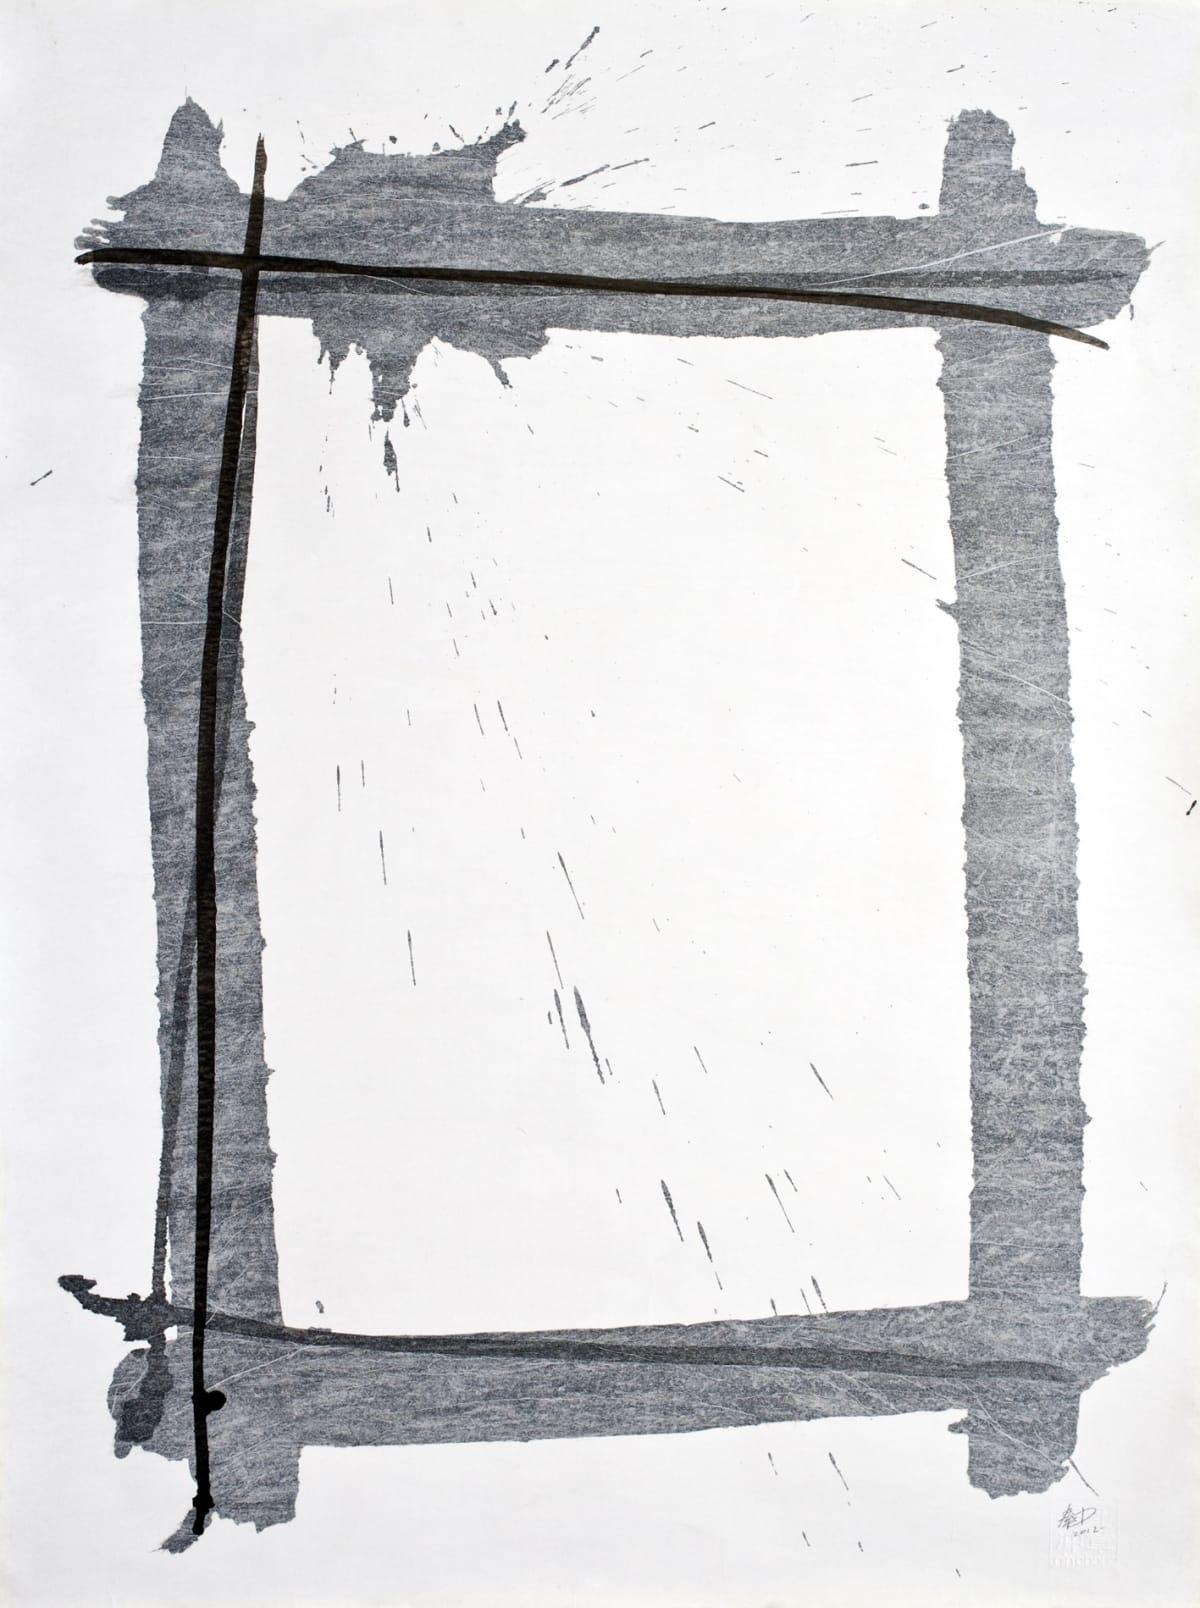 Qin Chong - 27 Feburary - Whatever